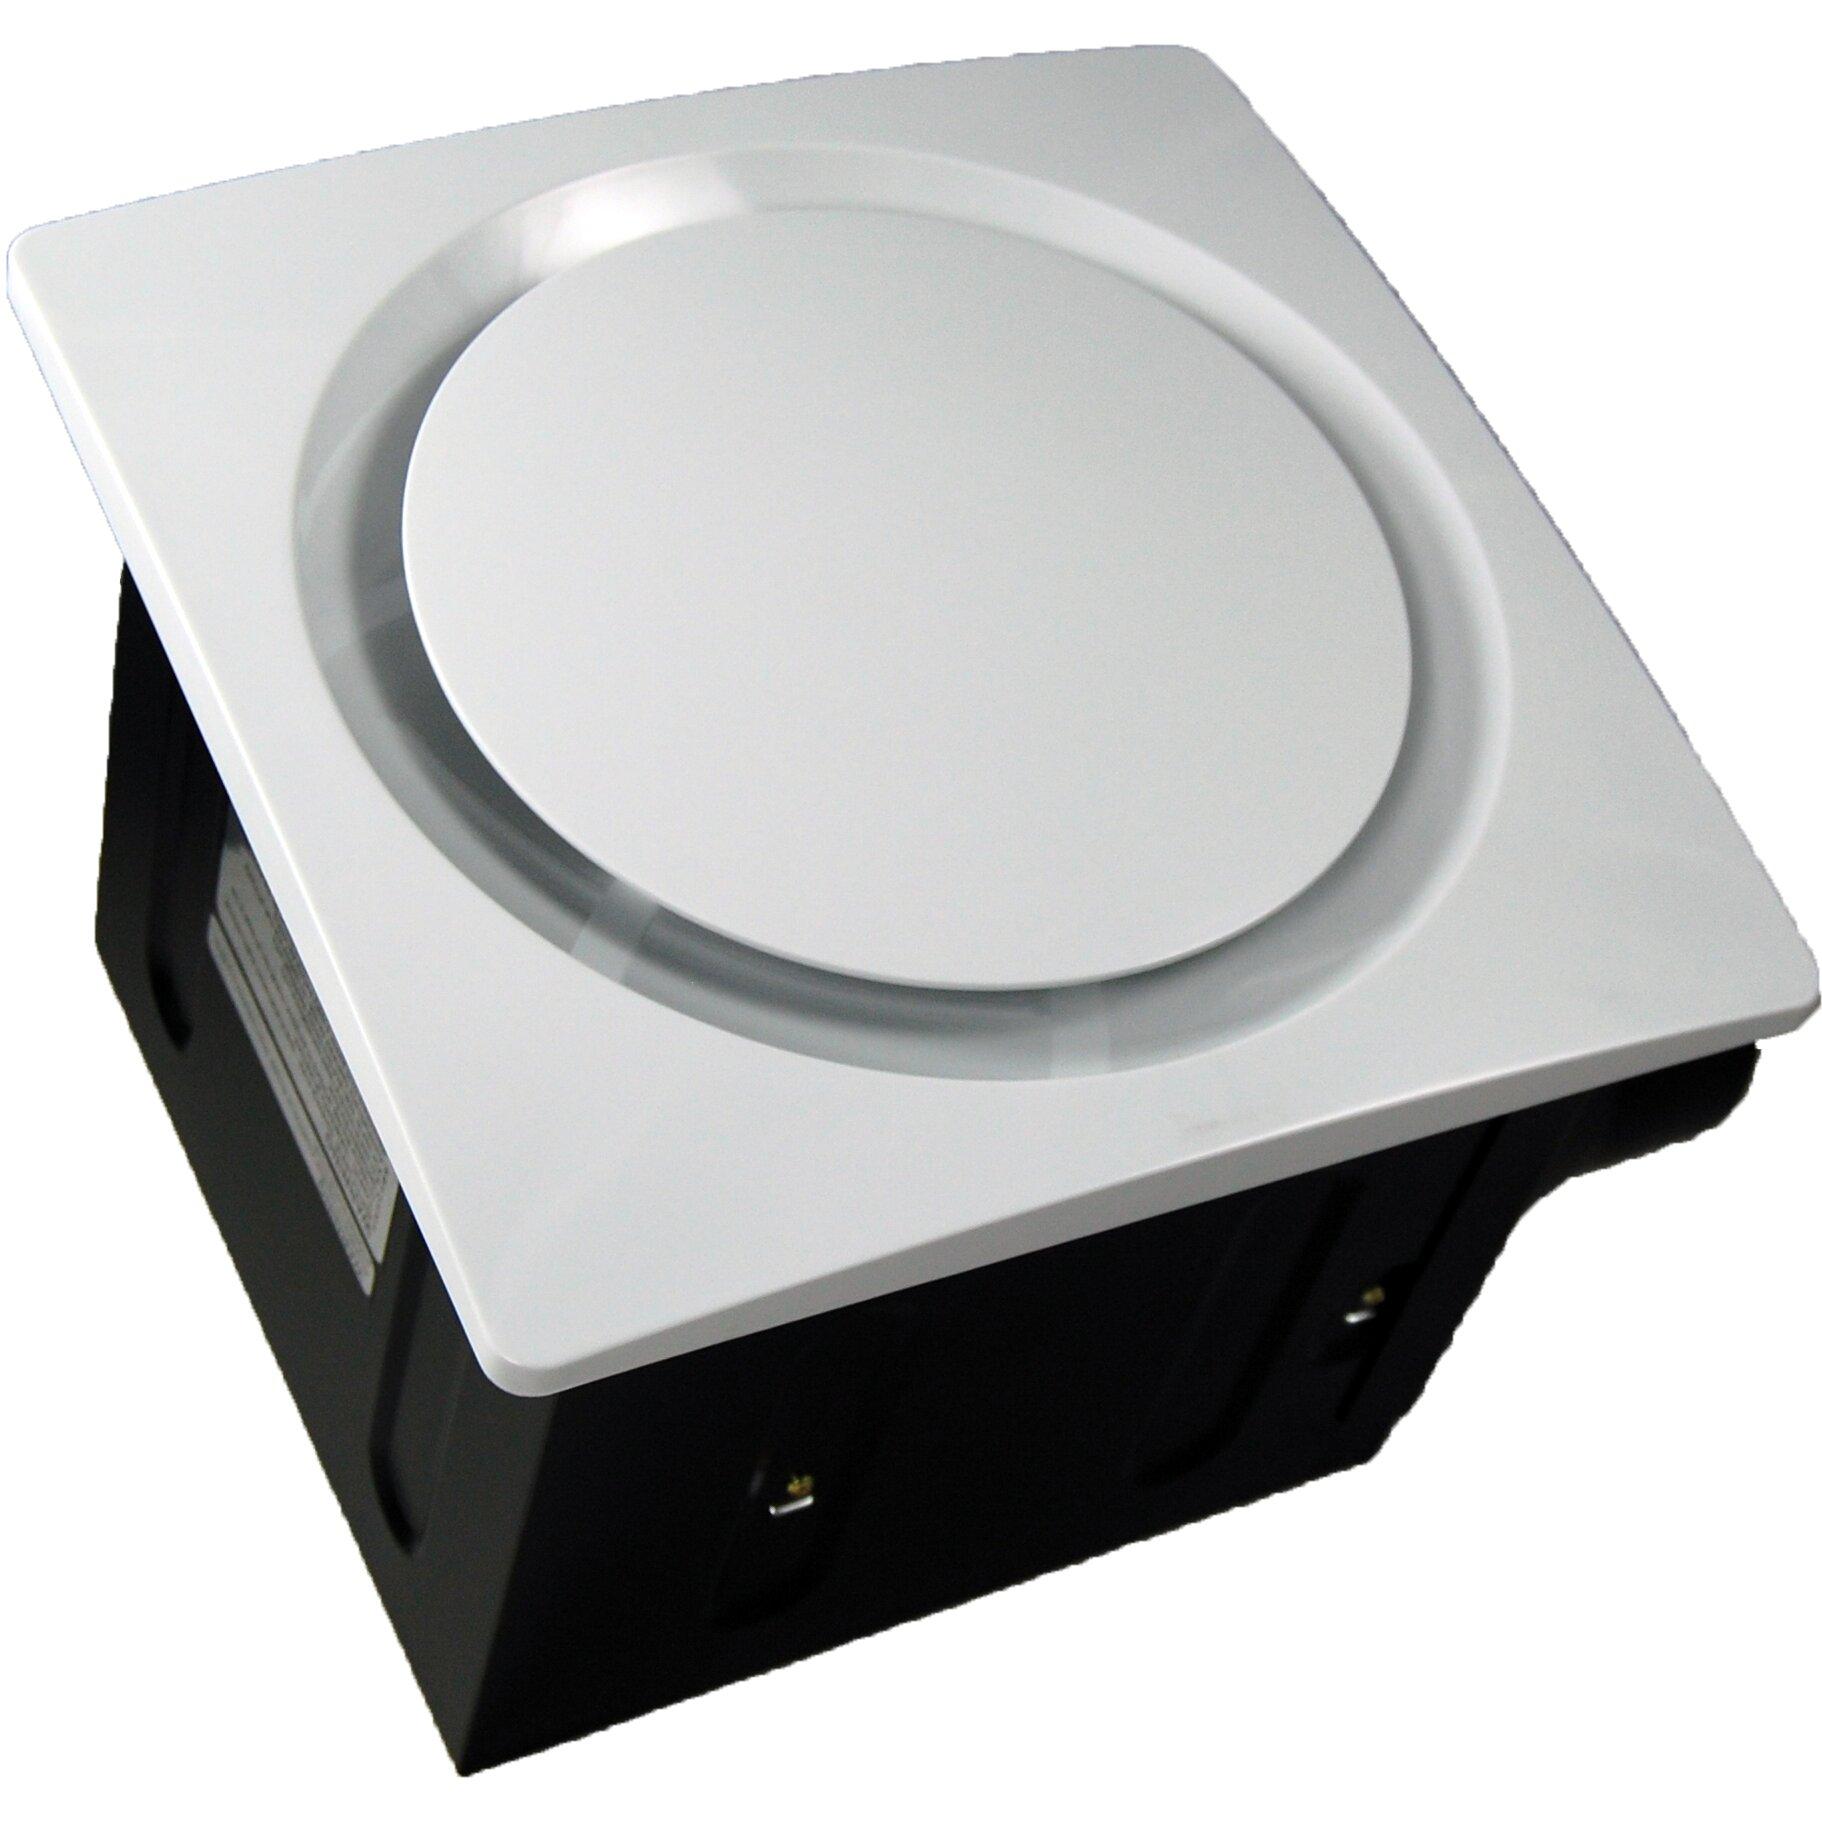 Quiet Bathroom Exhaust Fans: Aero Pure Super Quiet 110 CFM Bathroom Ventilation Fan